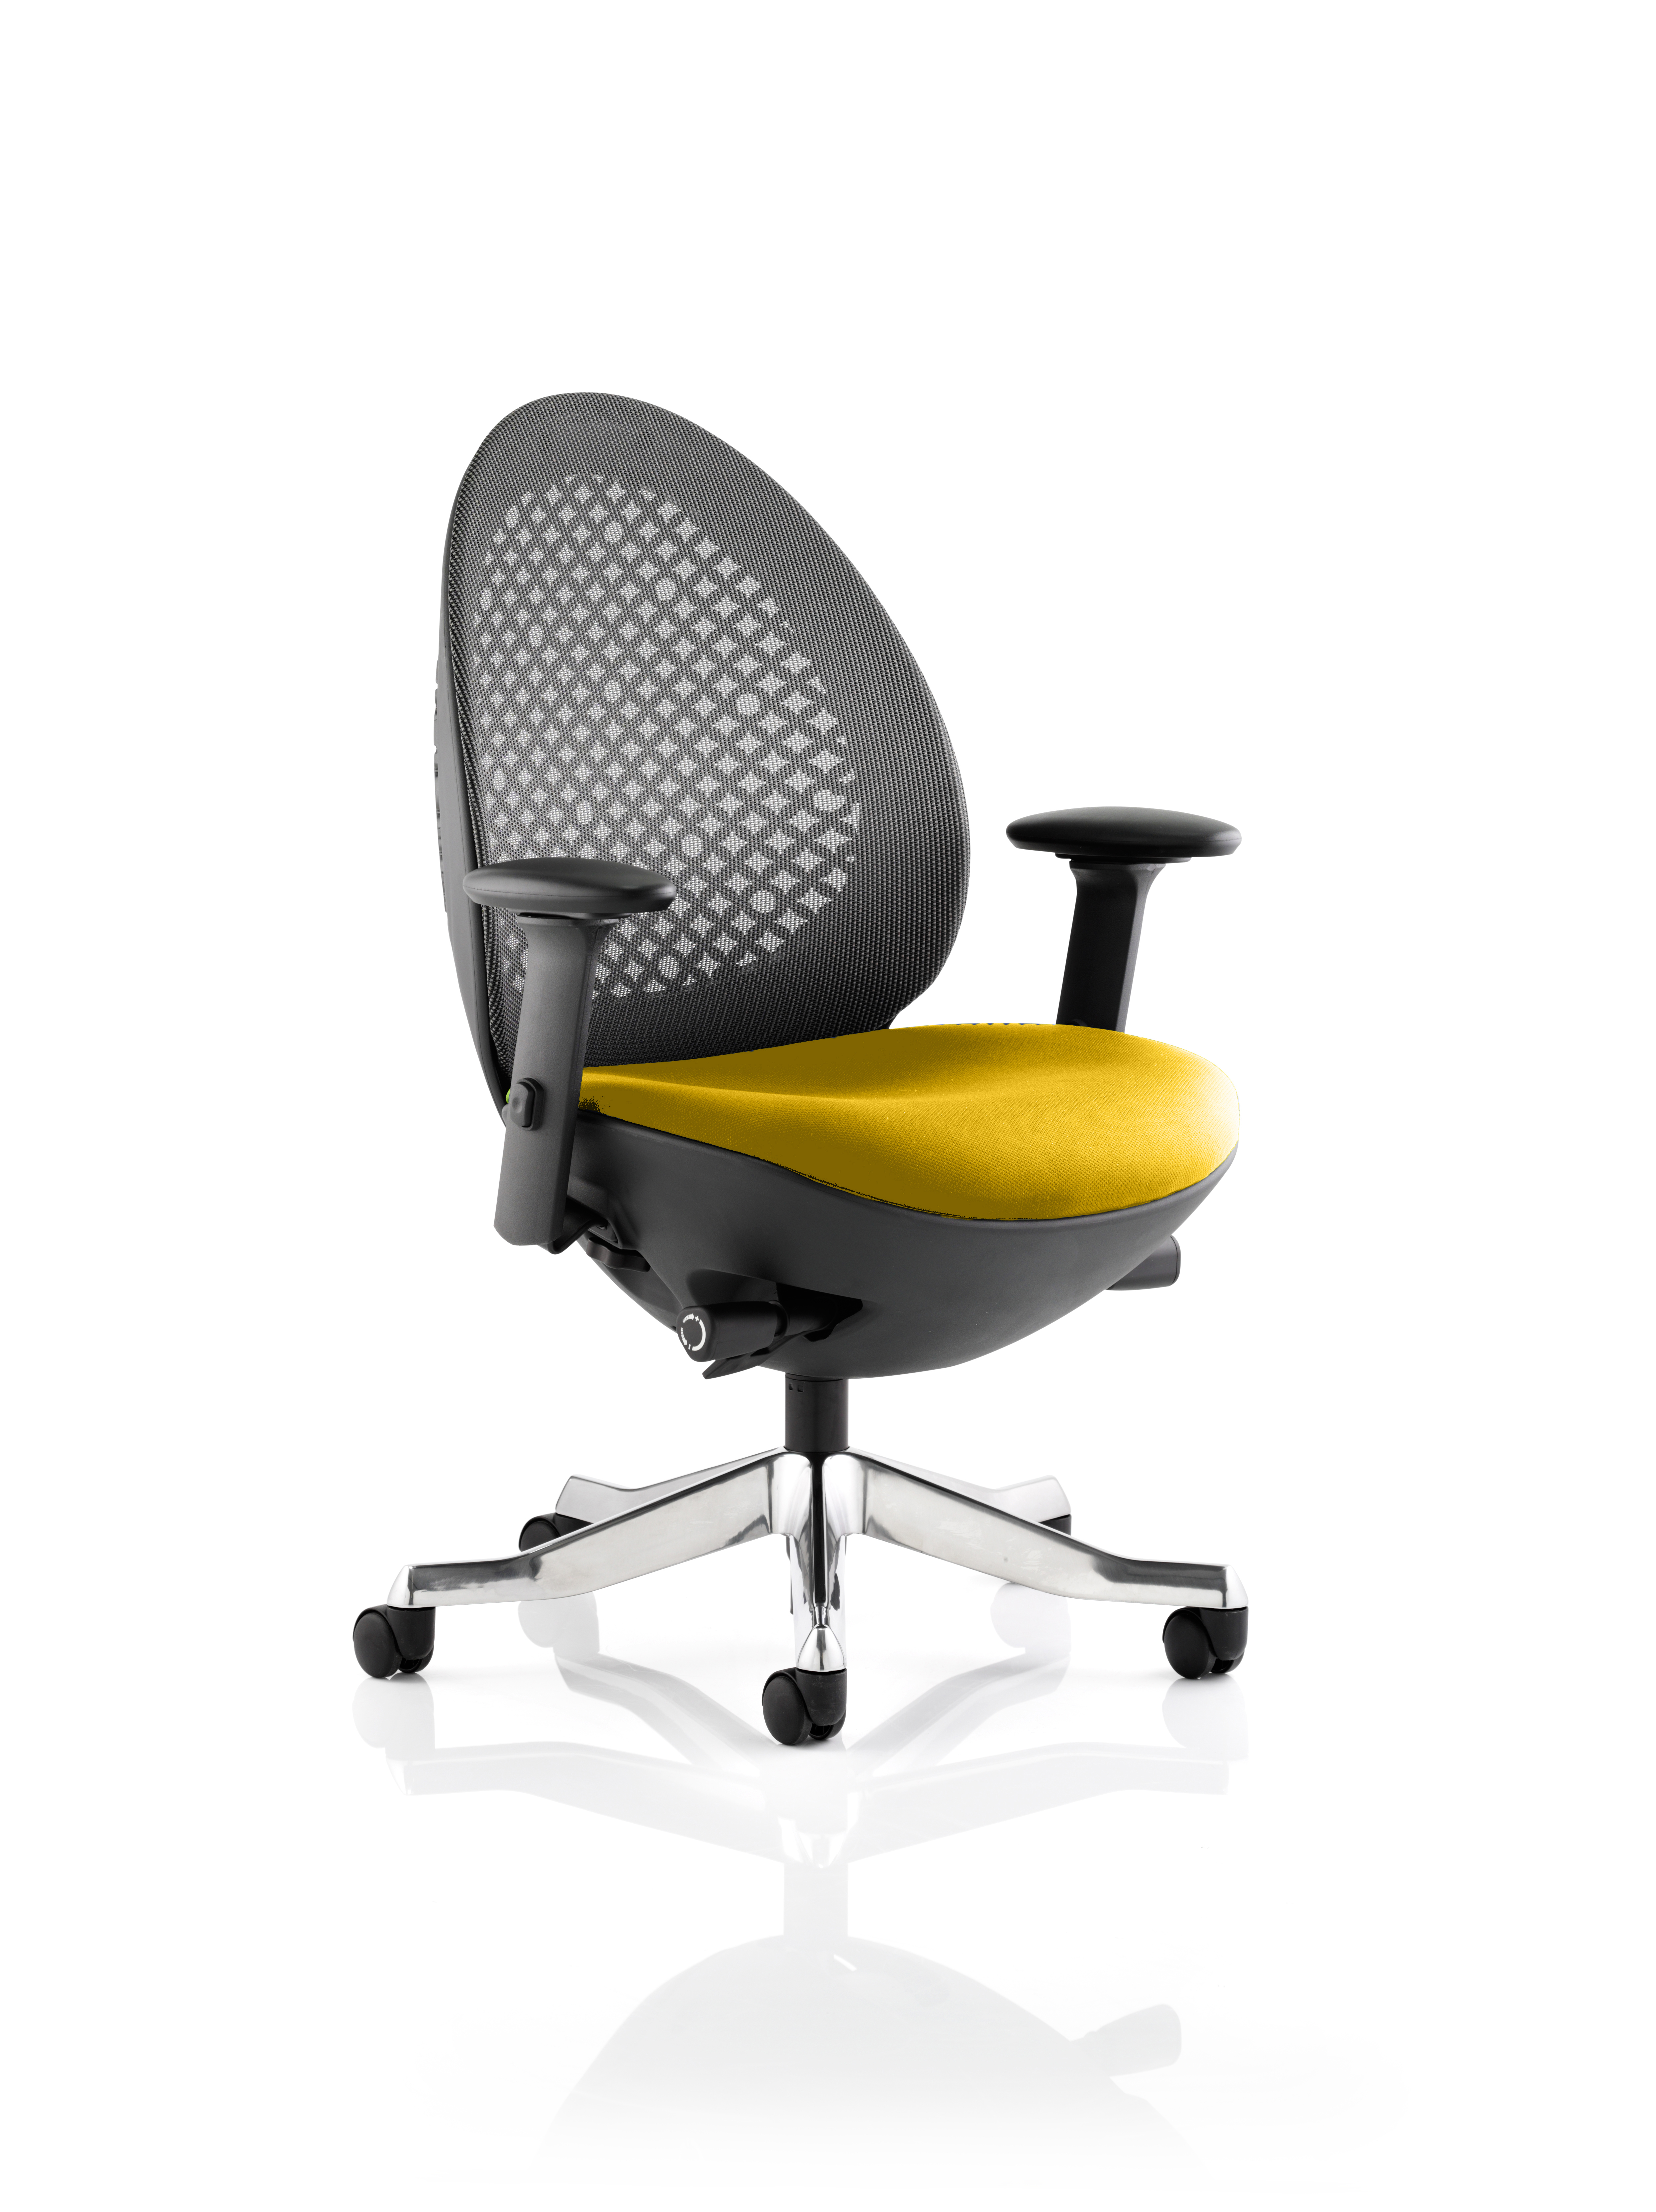 Revo Bespoke Colour Seat In Senna Yellow